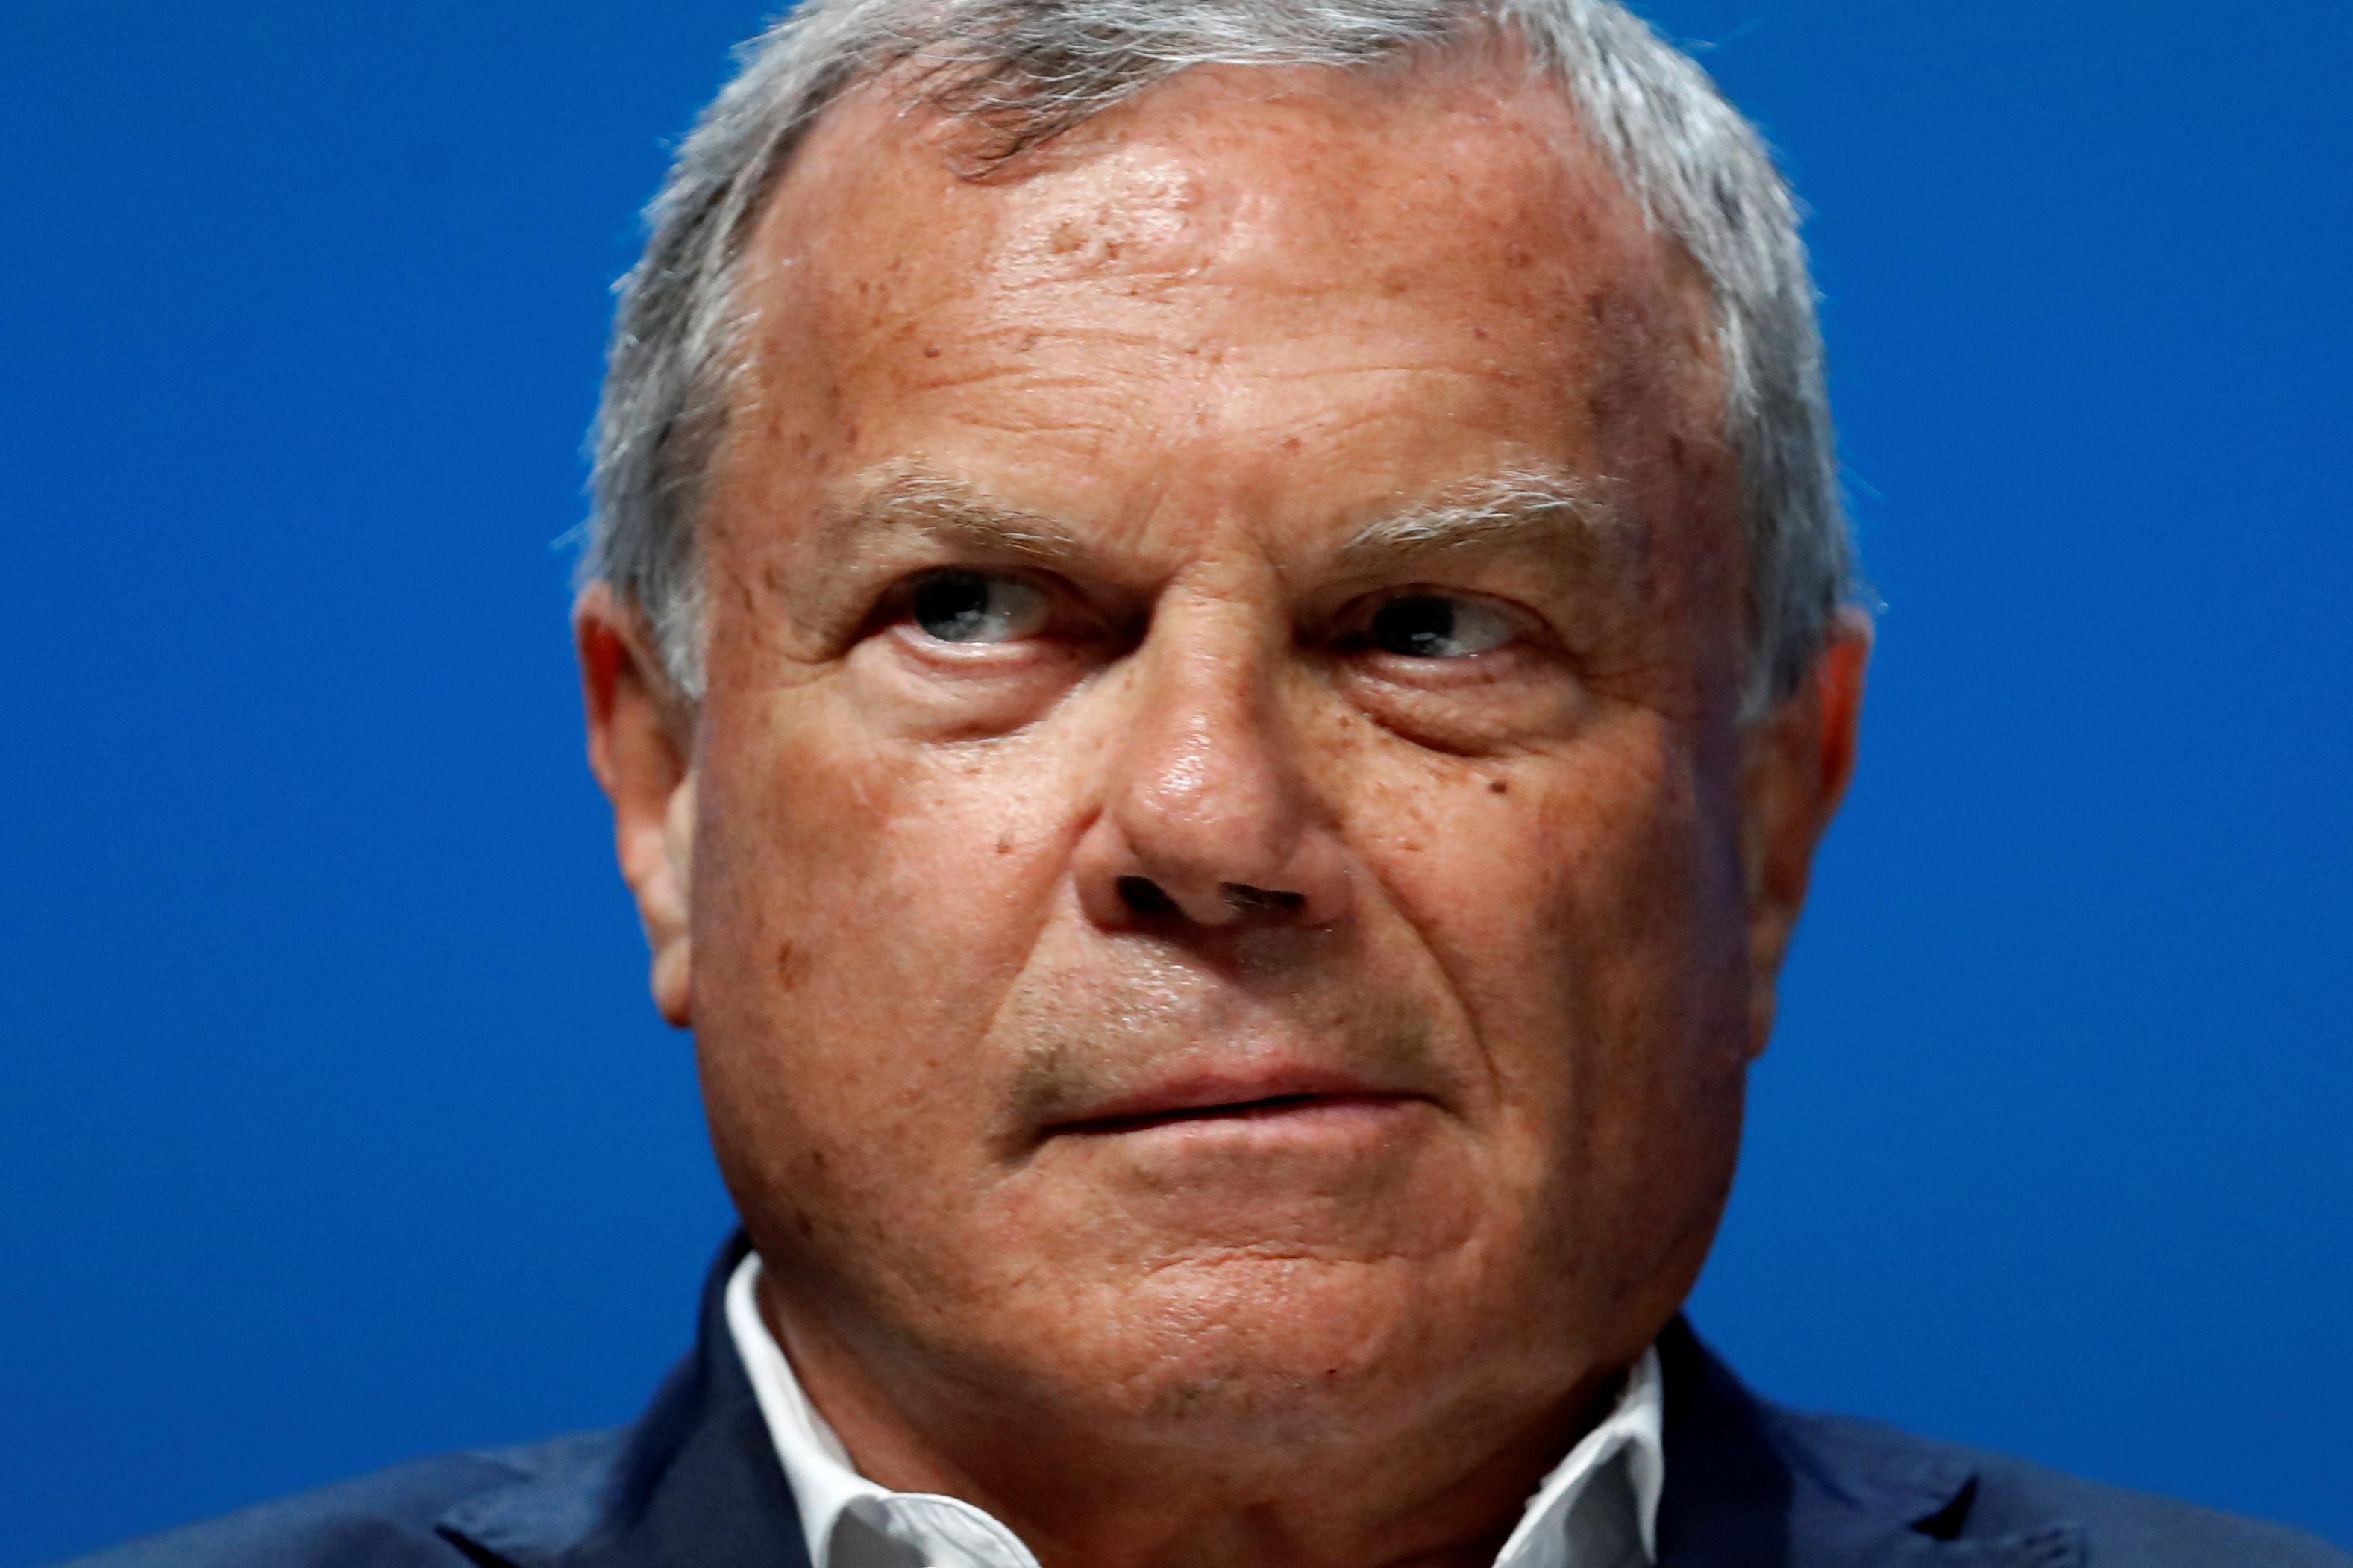 Sorrell's S4 Capital buys influencer agency IMA